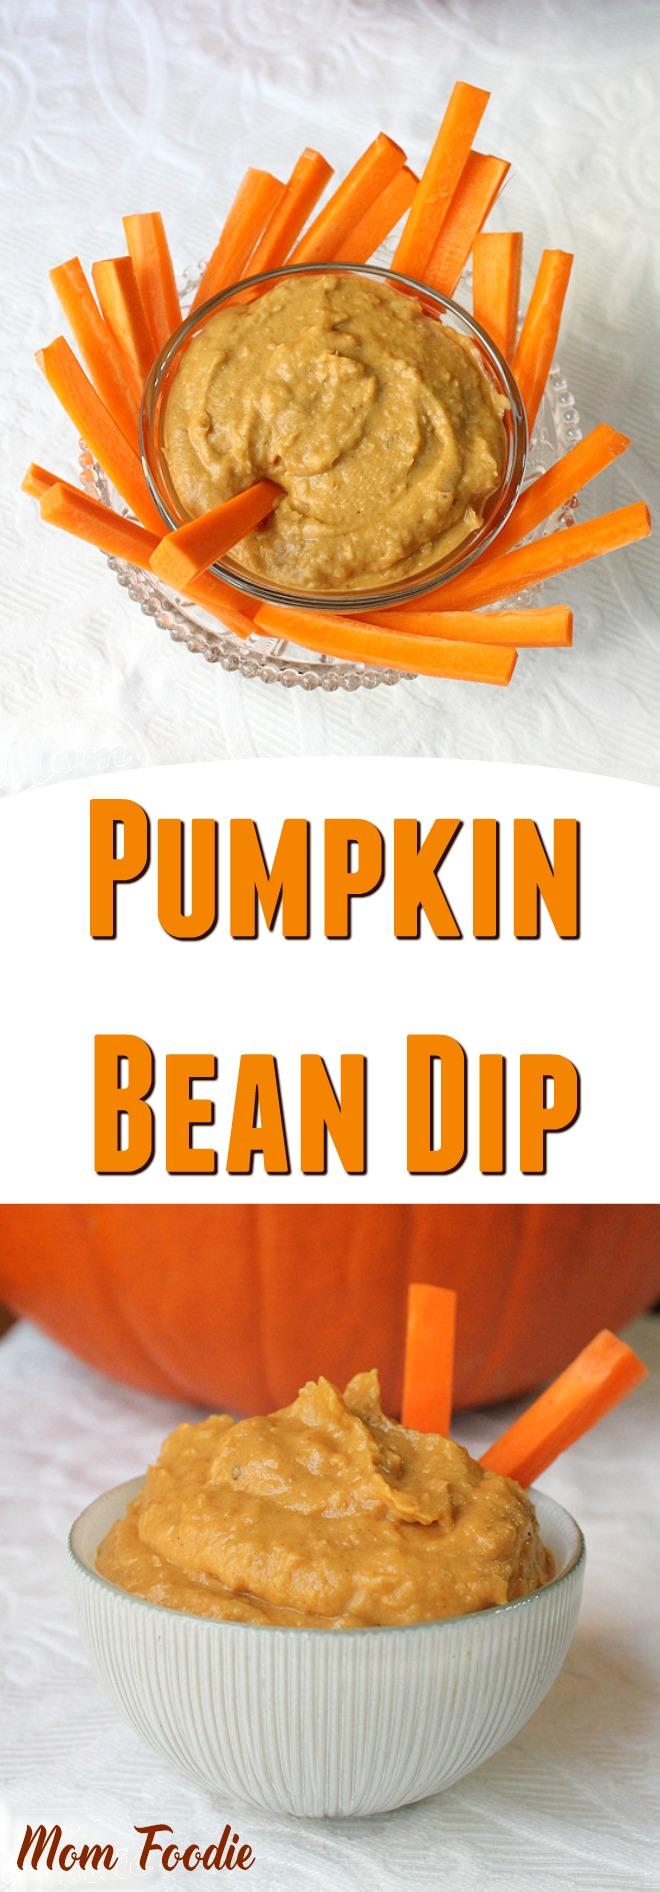 Pumpkin Bean Dip Recipe - Easy Fall appetizer